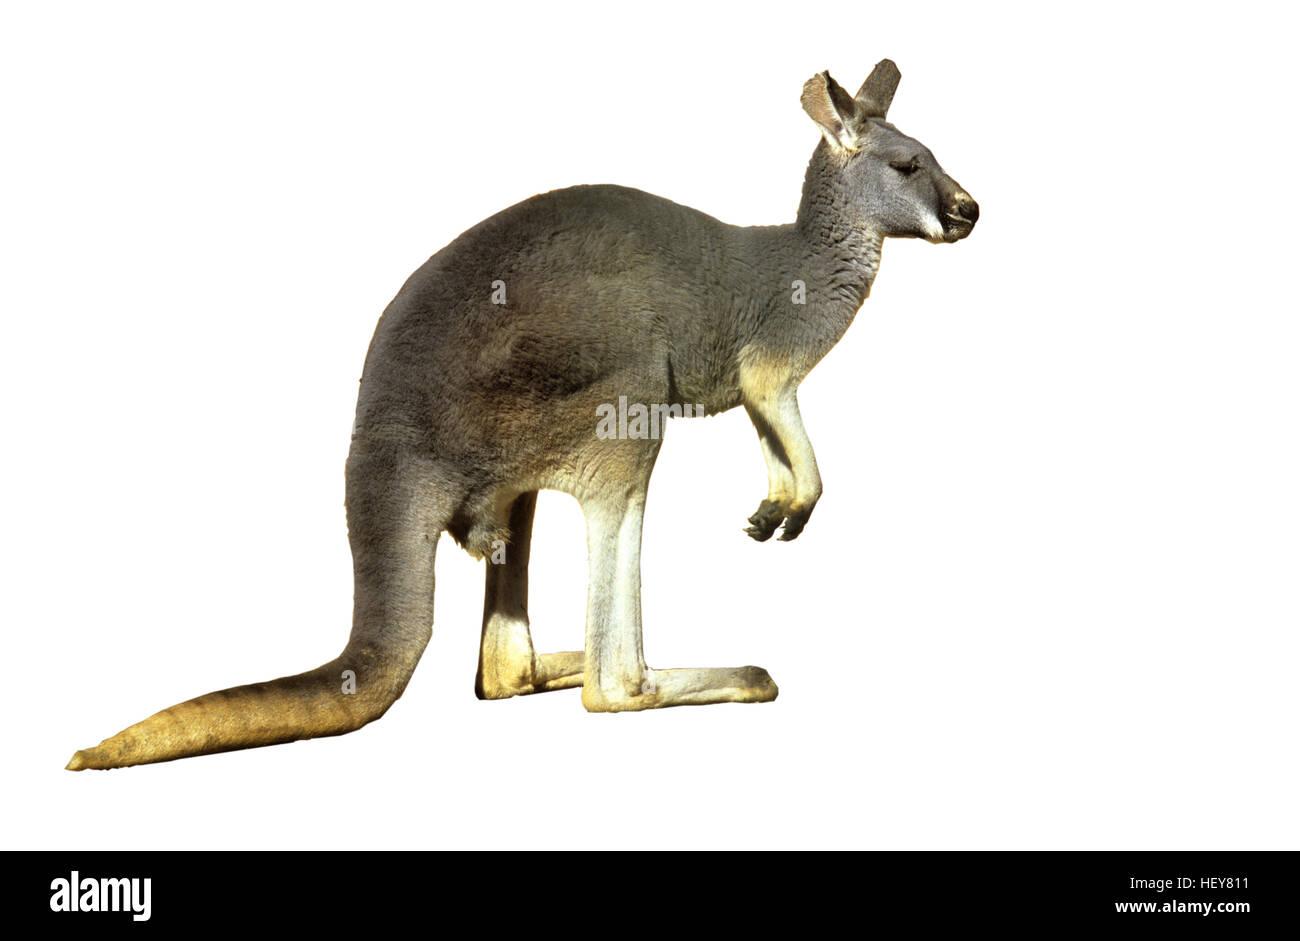 Eastern grey kangaroo, Macropus giganteus - Stock Image